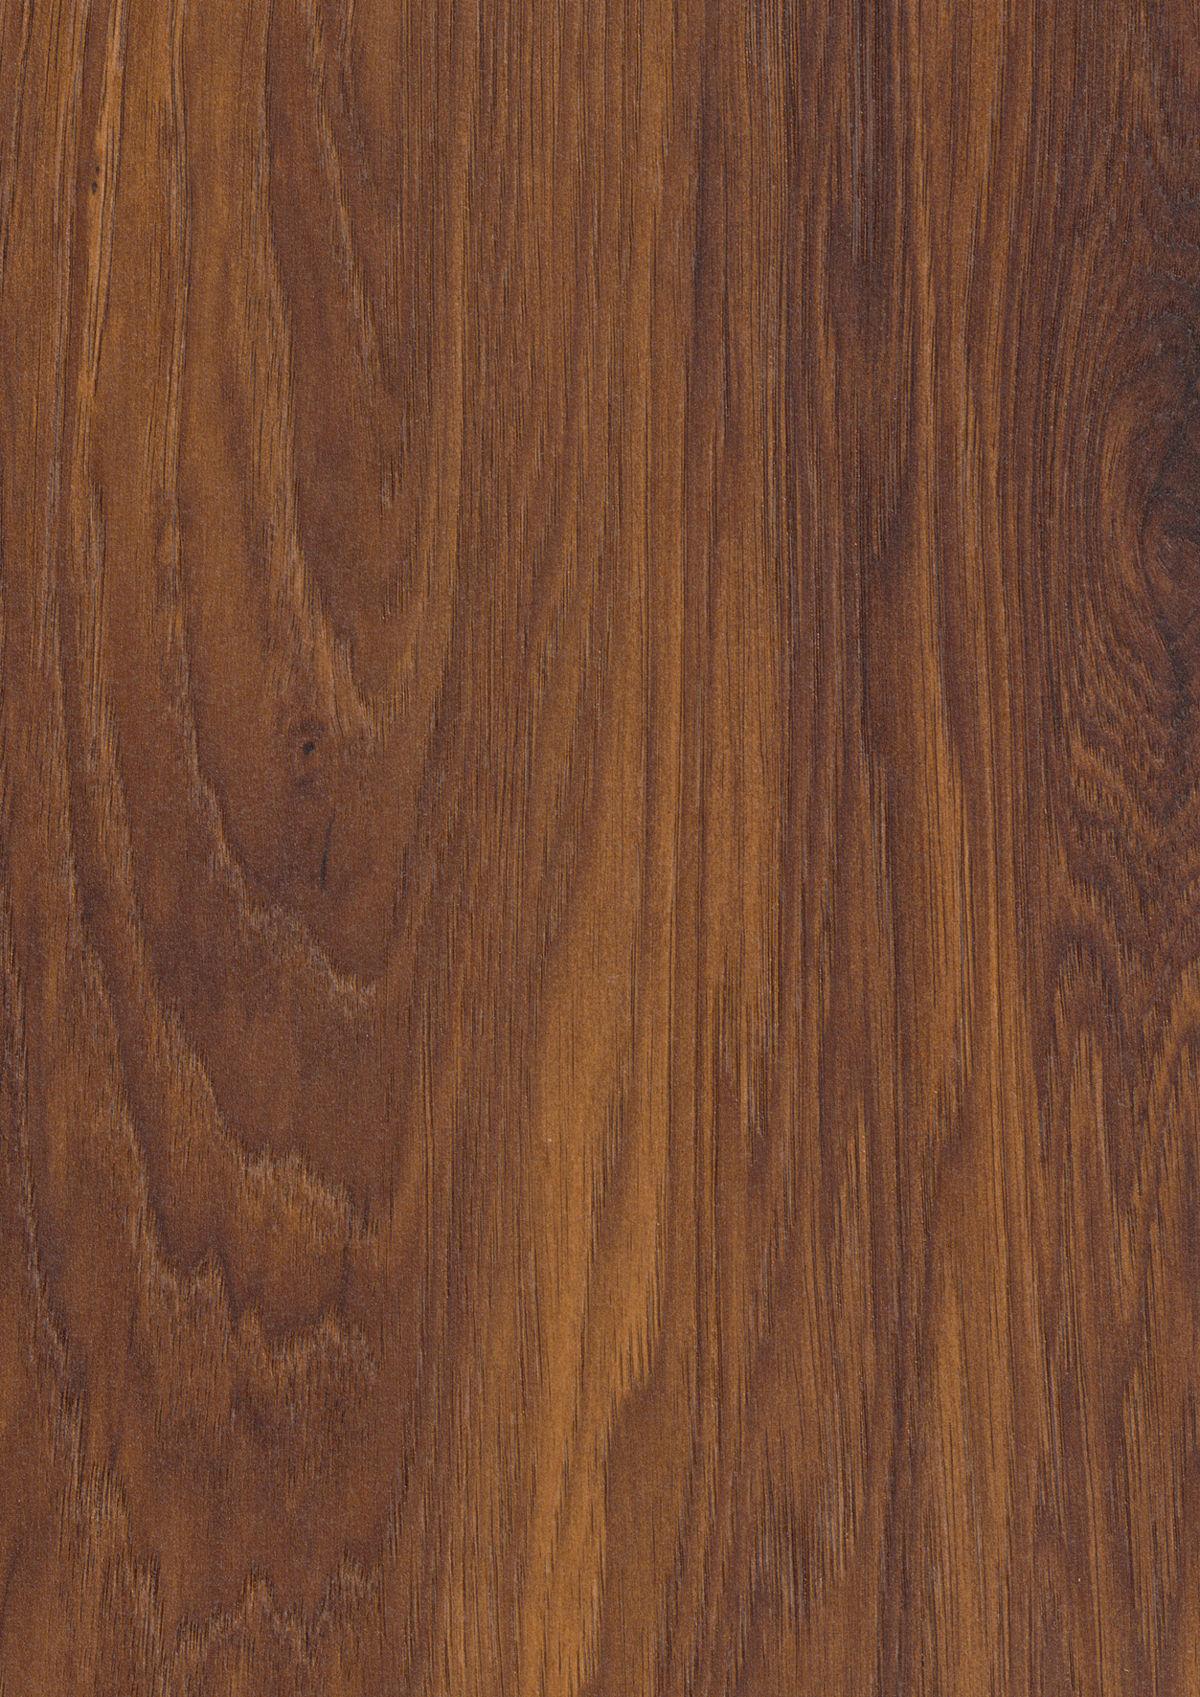 Kronospan Vintage Red River Hickory Laminate Flooring